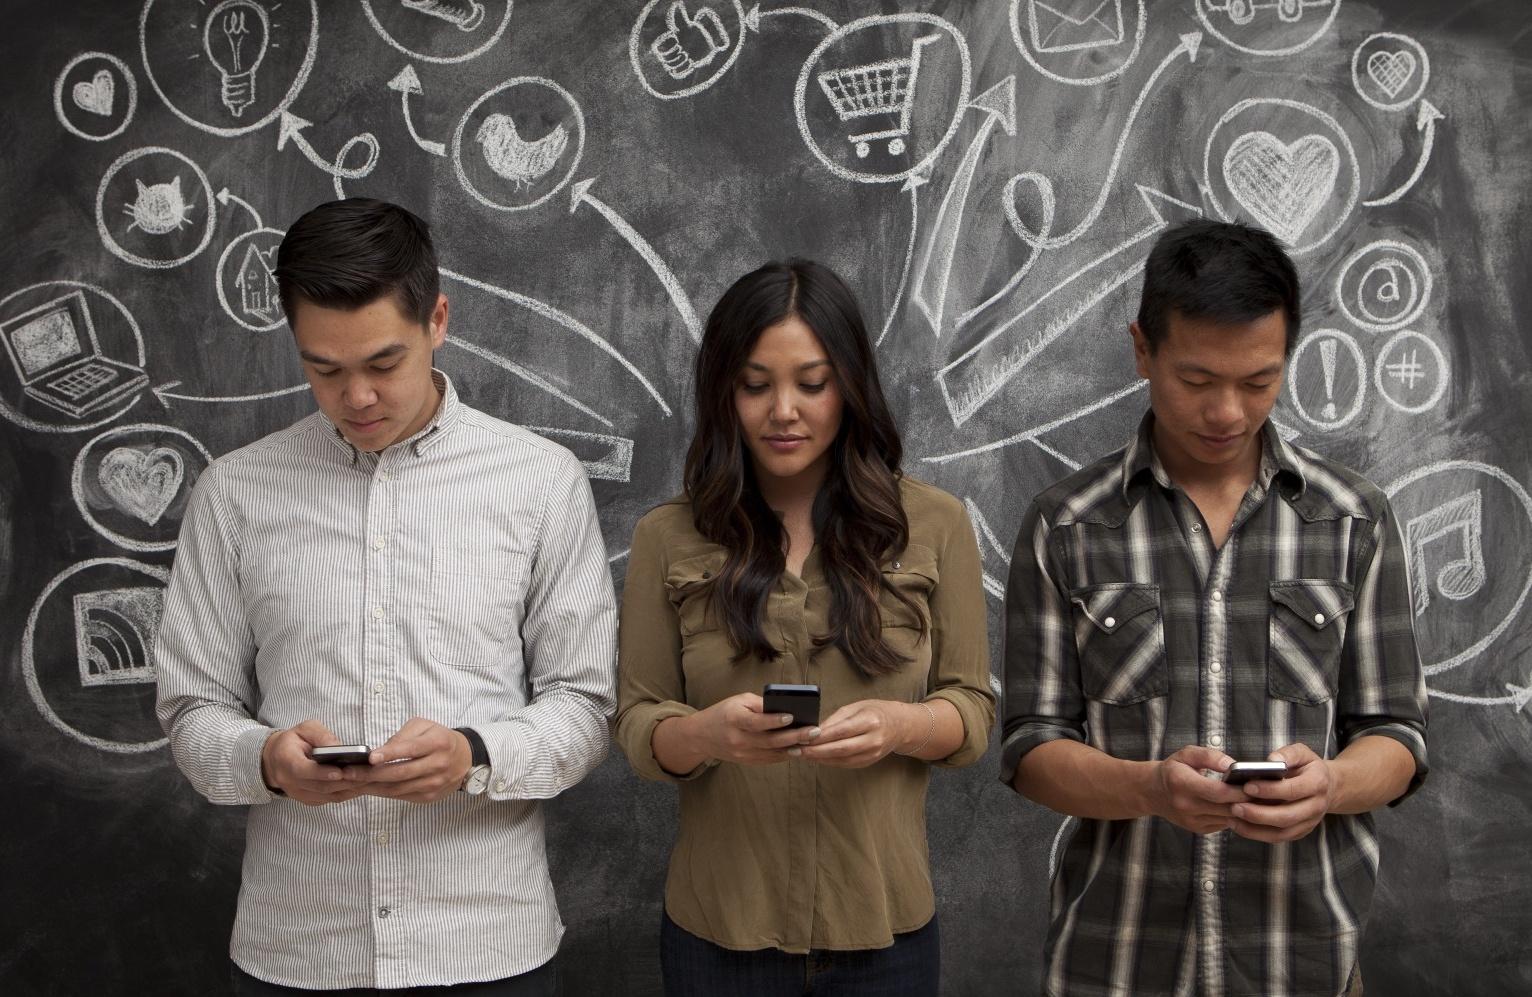 Students and Social Media